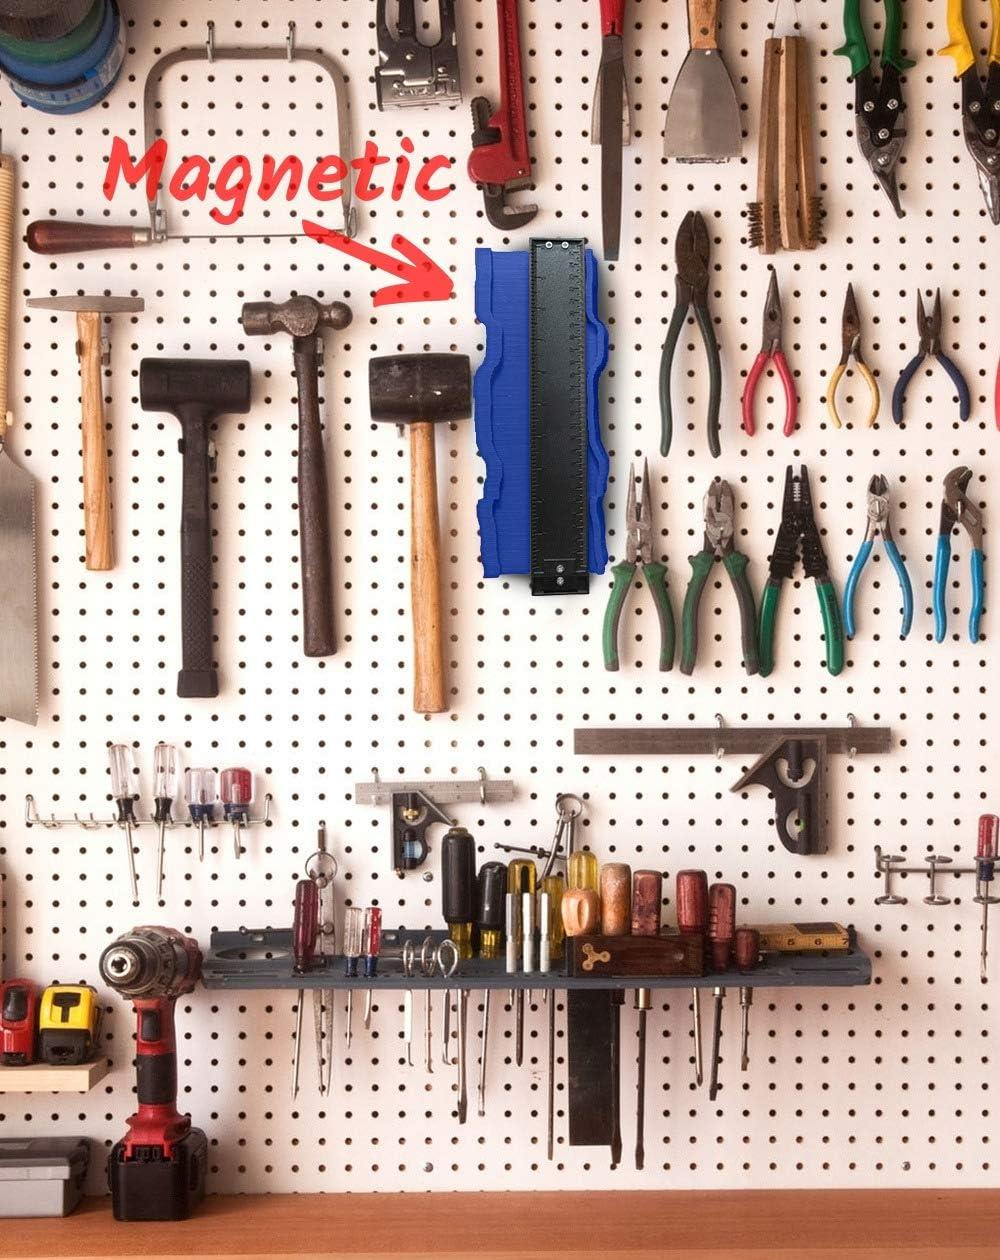 Profile Shape Ez Duplicator Tool 10 Inch Irregular Welding Carpenters Master Outline Contour Gauge Momenturn Easy Copy Ruler Instant Template Ezgauge 2019 Upgraded Light Blue